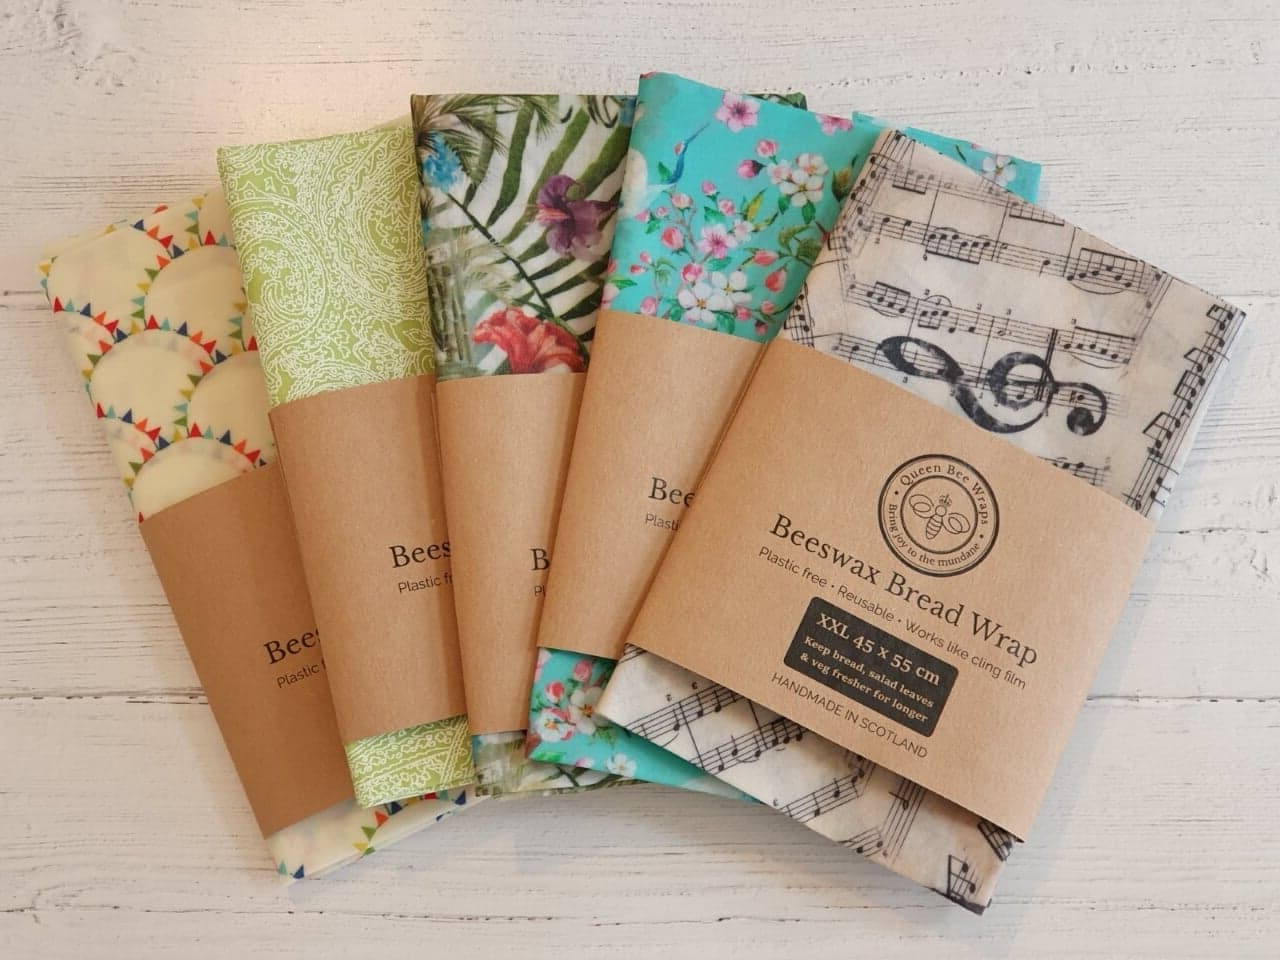 Scottish Beeswax Wraps